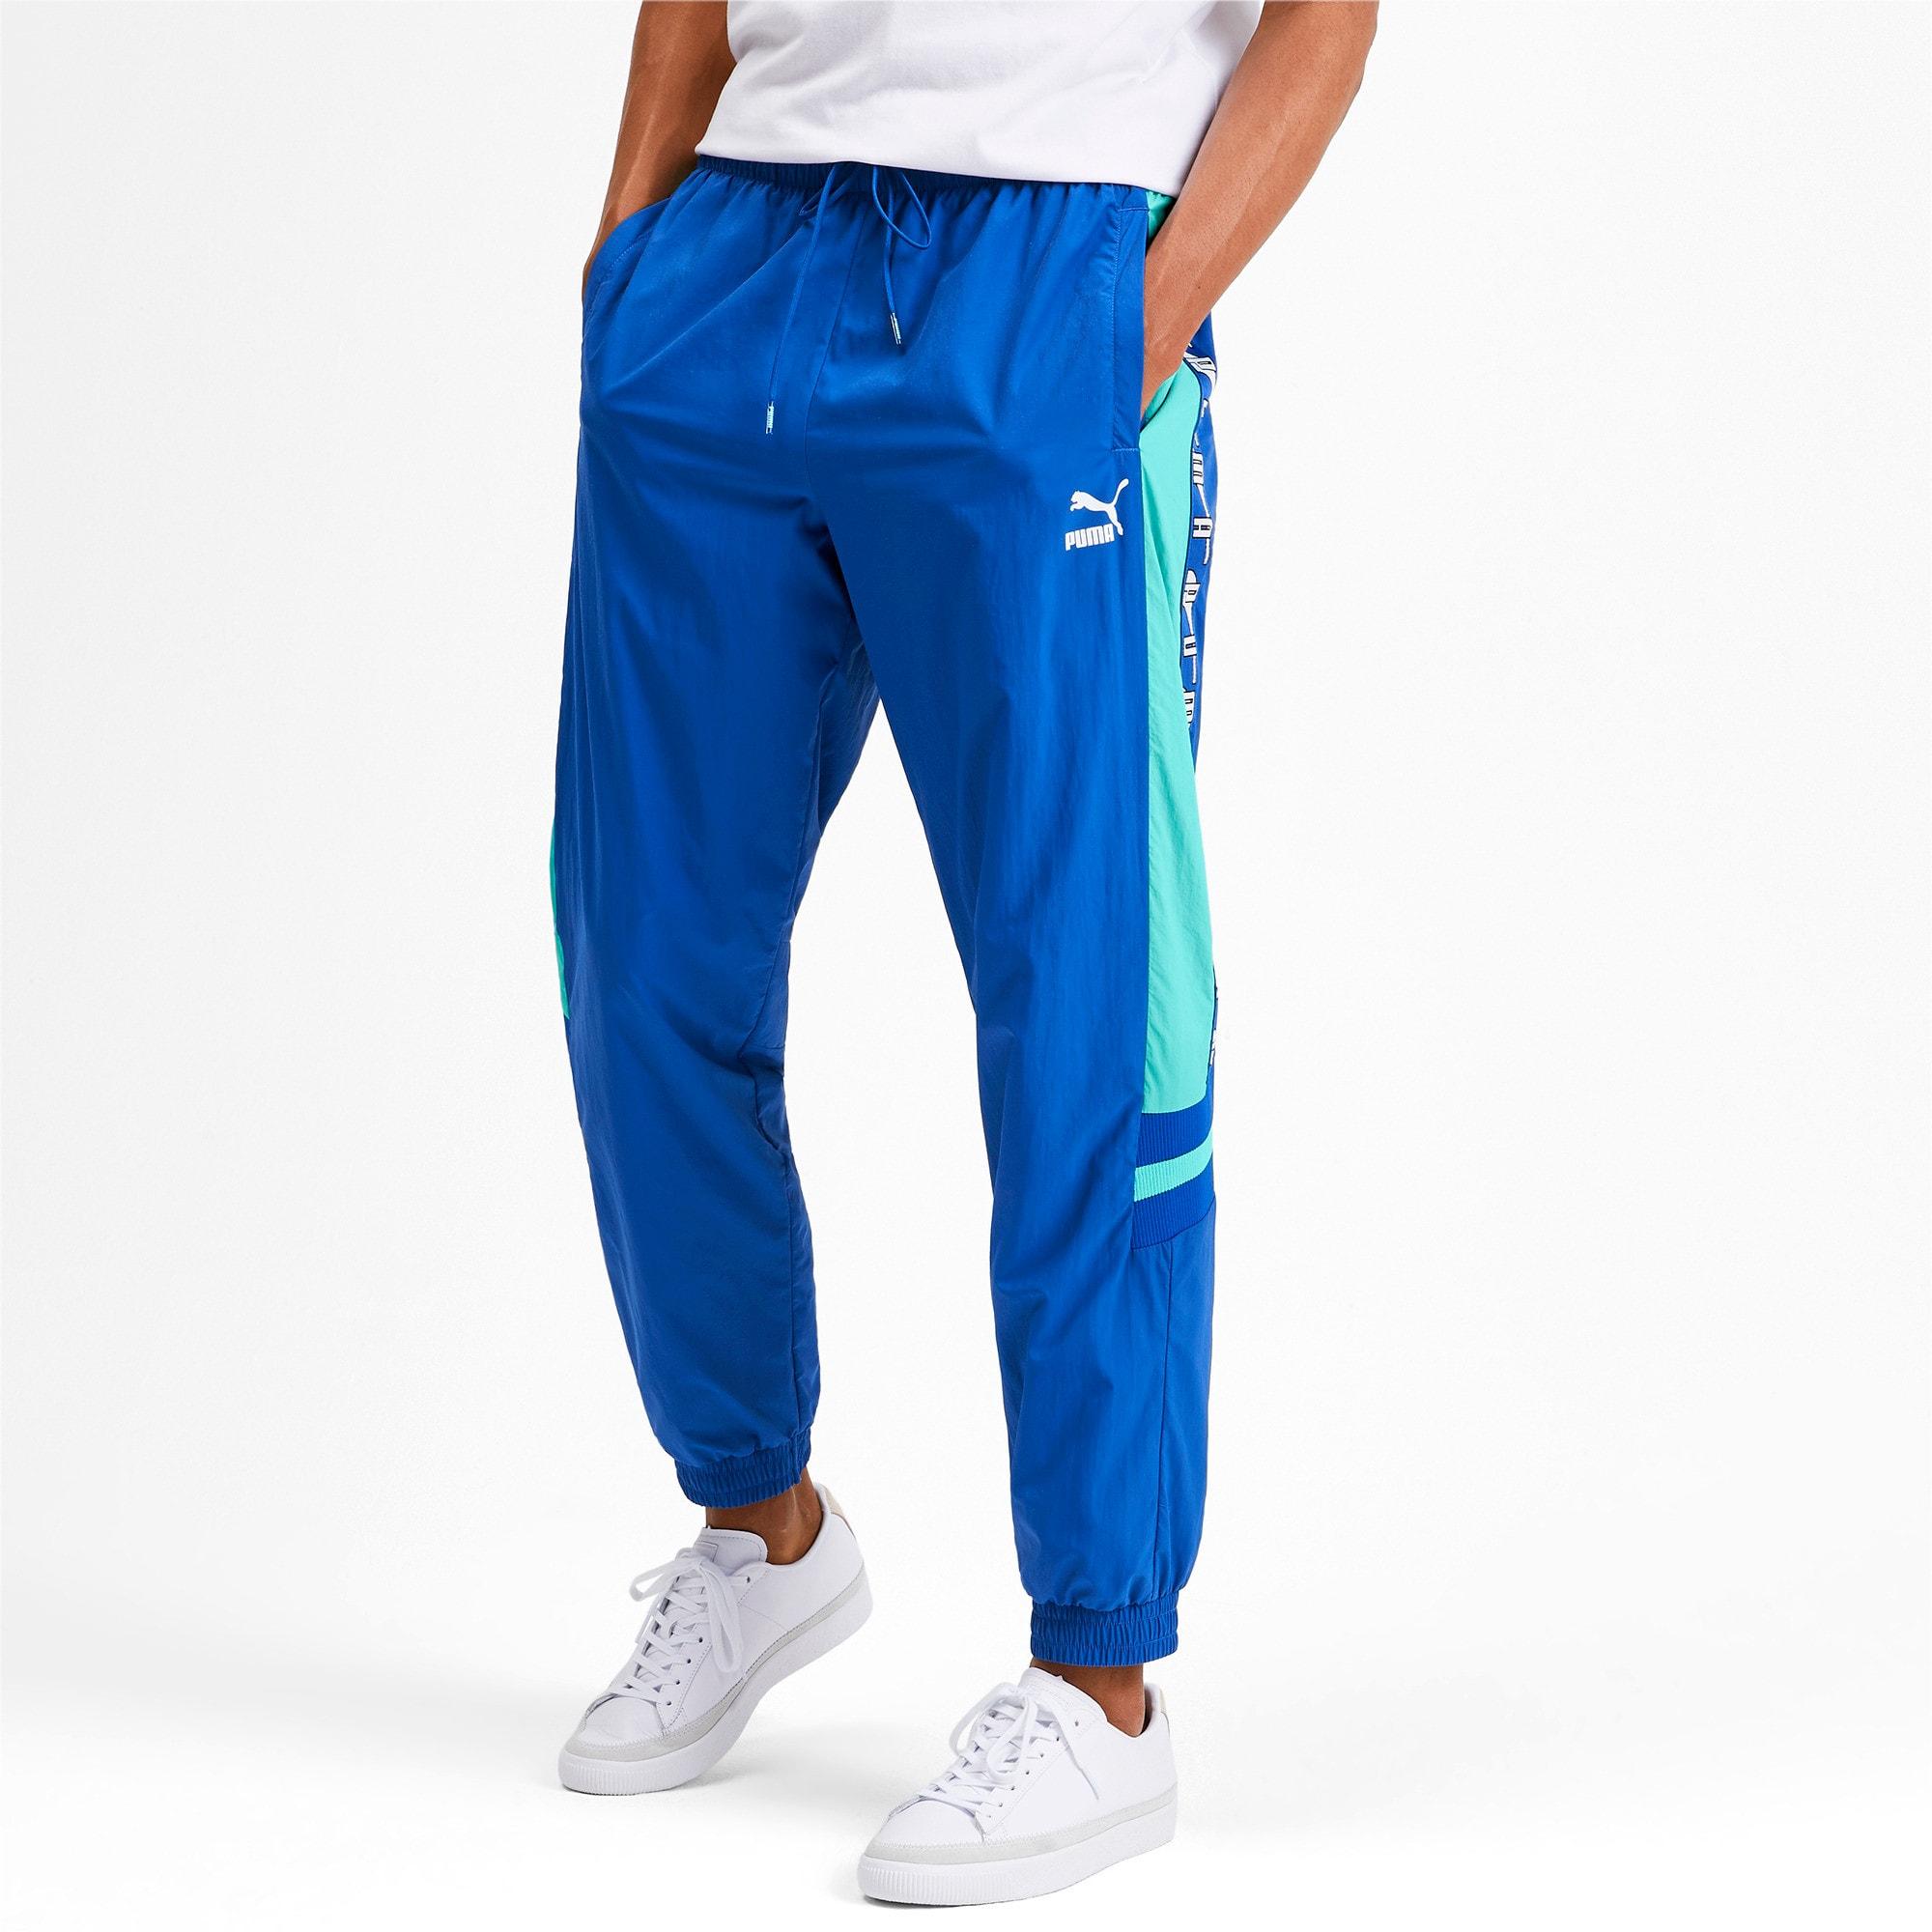 Thumbnail 2 of PUMA XTG Men's Woven Pants, Galaxy Blue, medium